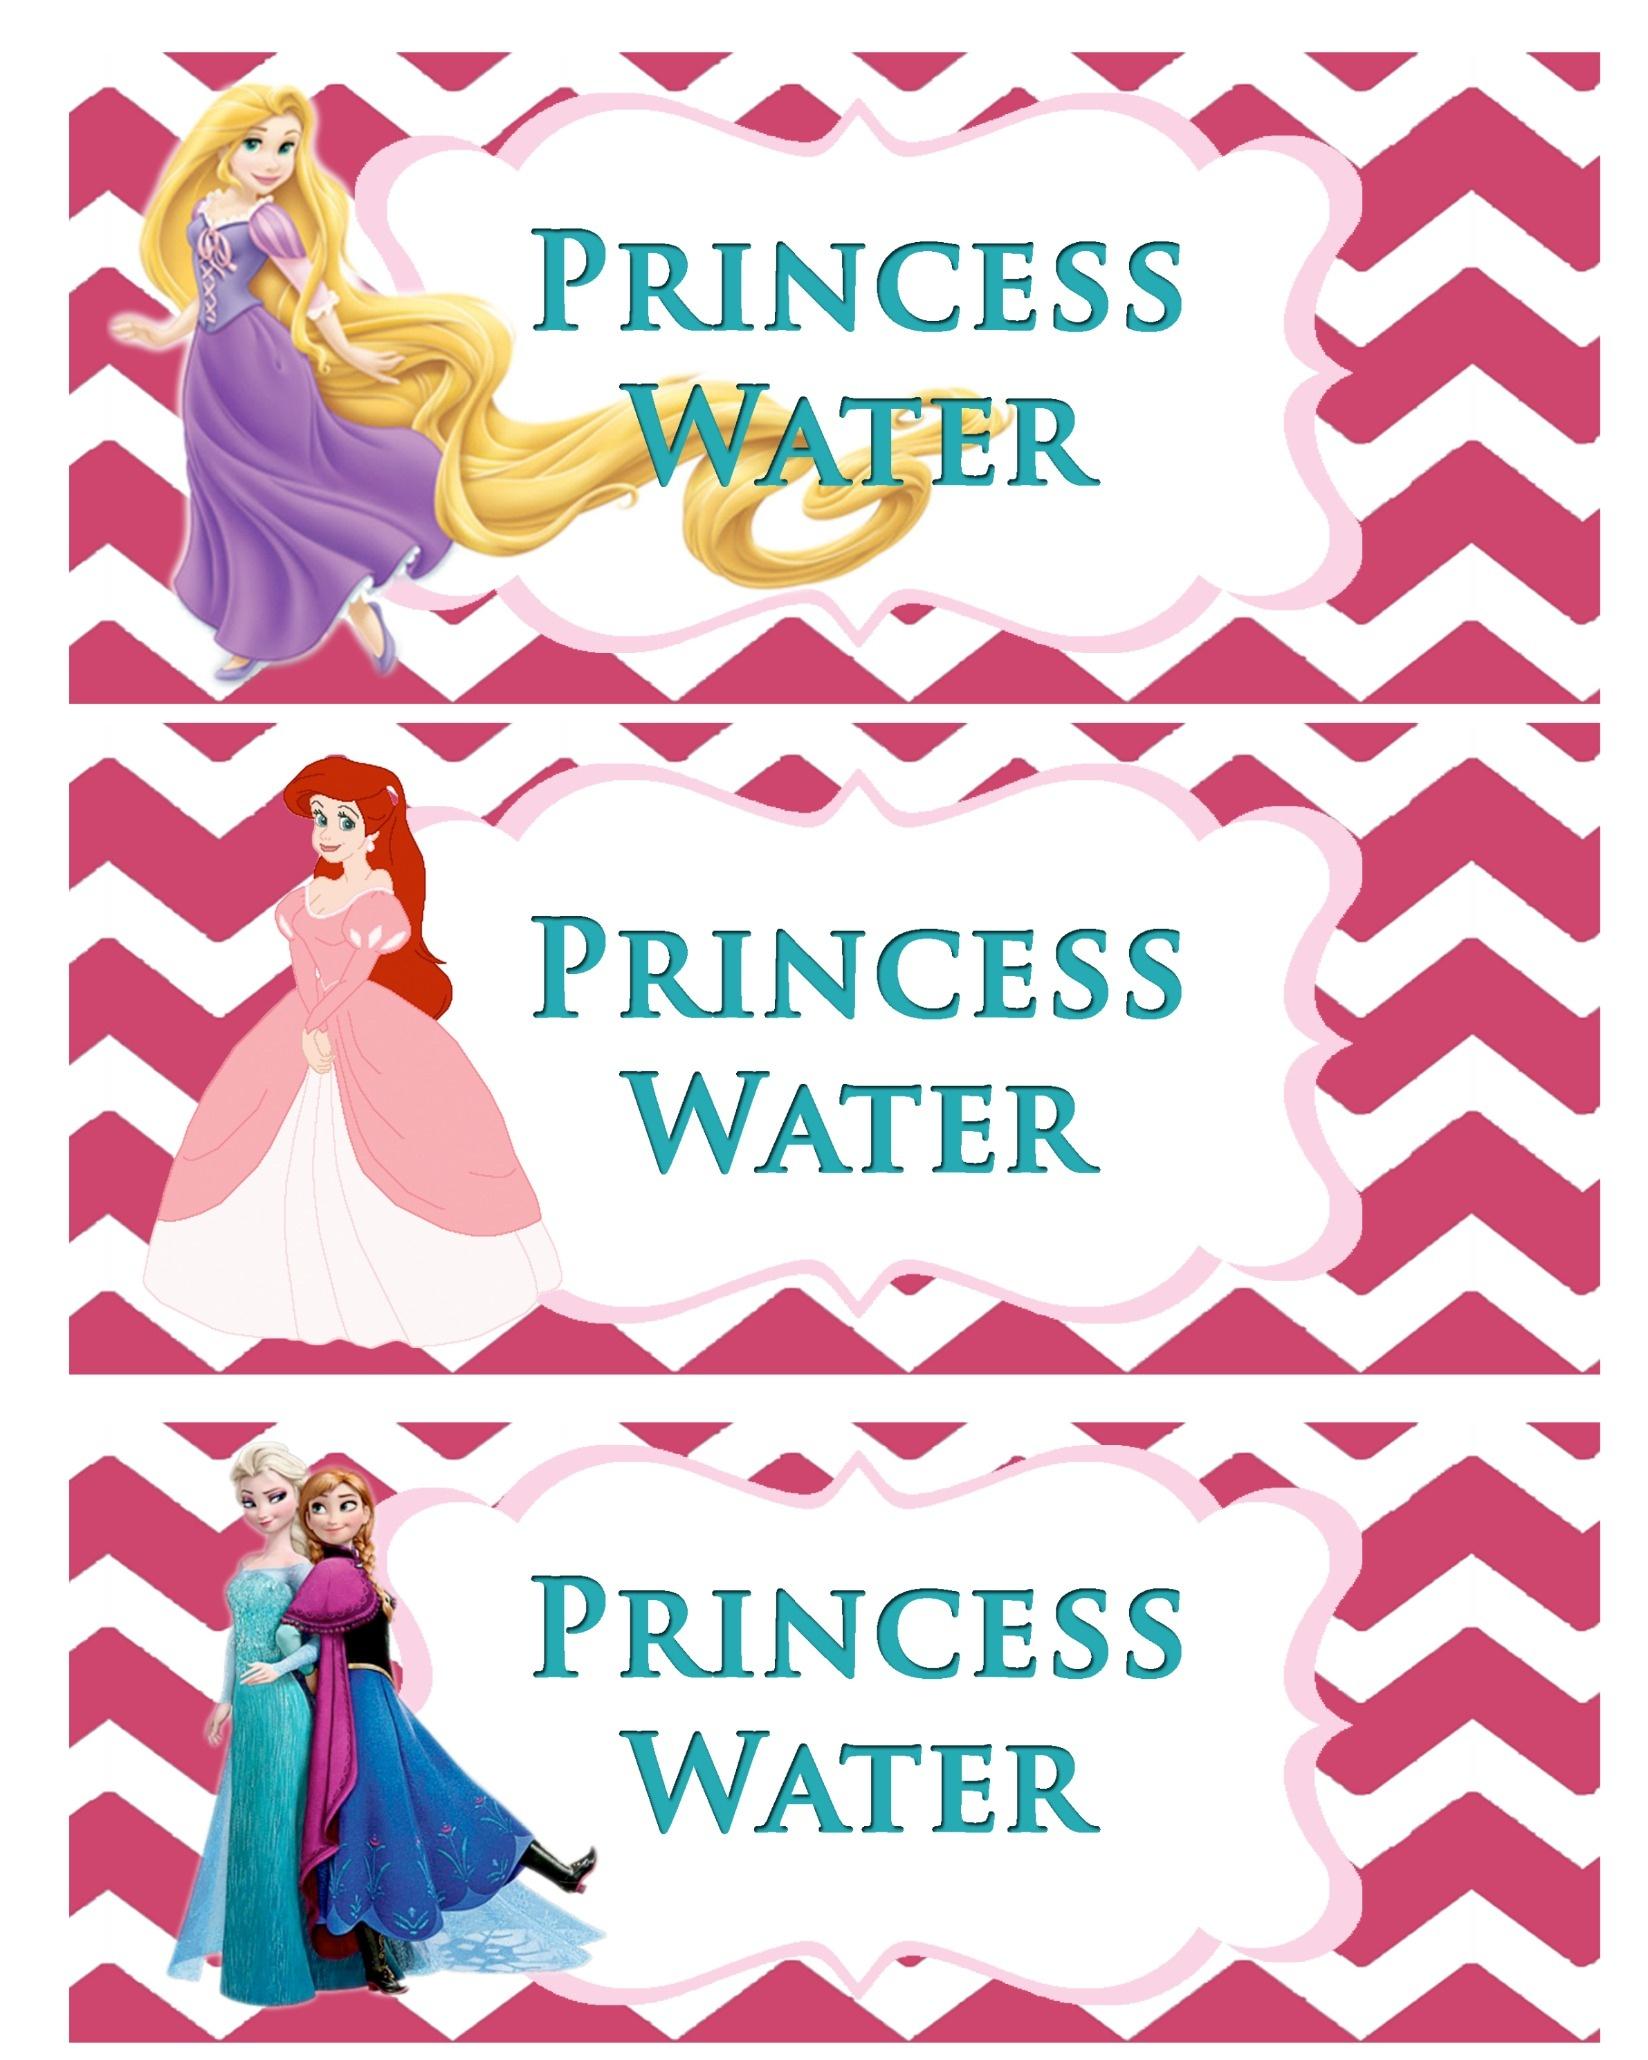 Princess Party-Free Printable - Free Printable Princess Birthday Banner